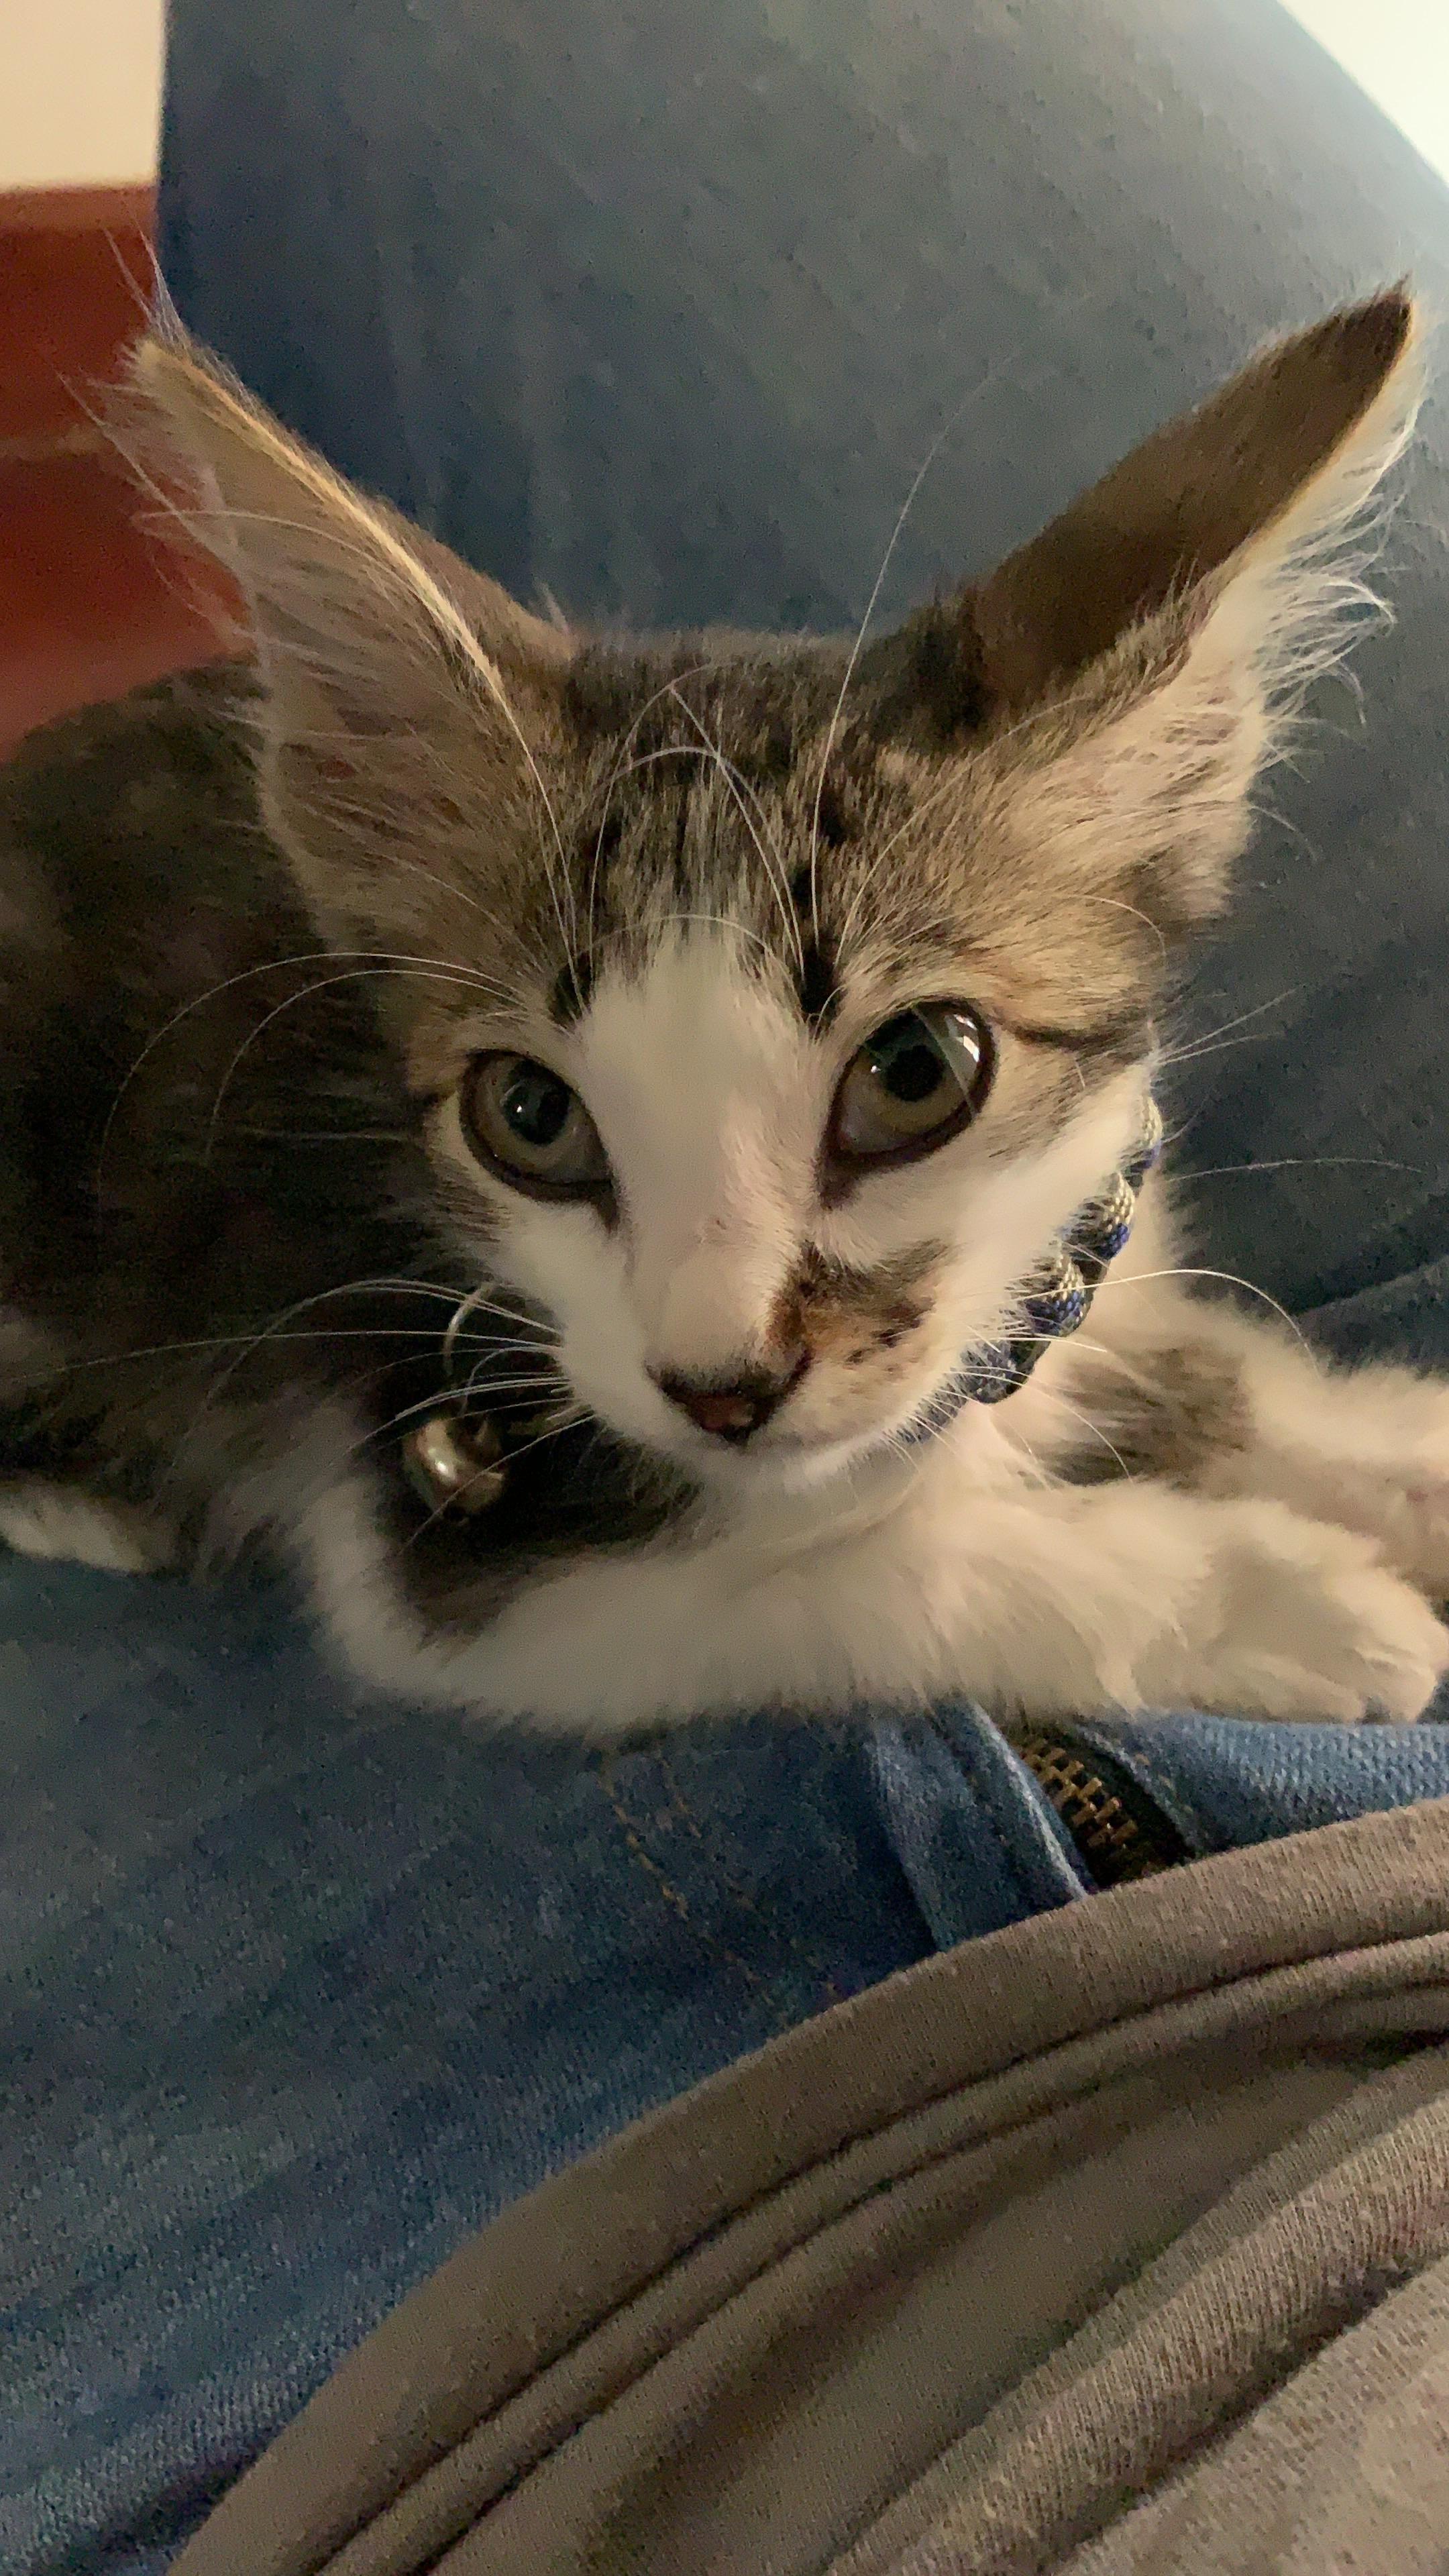 Heard That Reddit Loves Kittens Please Say Hello To Bandit Https Ift Tt 3dkgjwv In 2020 Cat Qoutes Kittens Crazy Cats